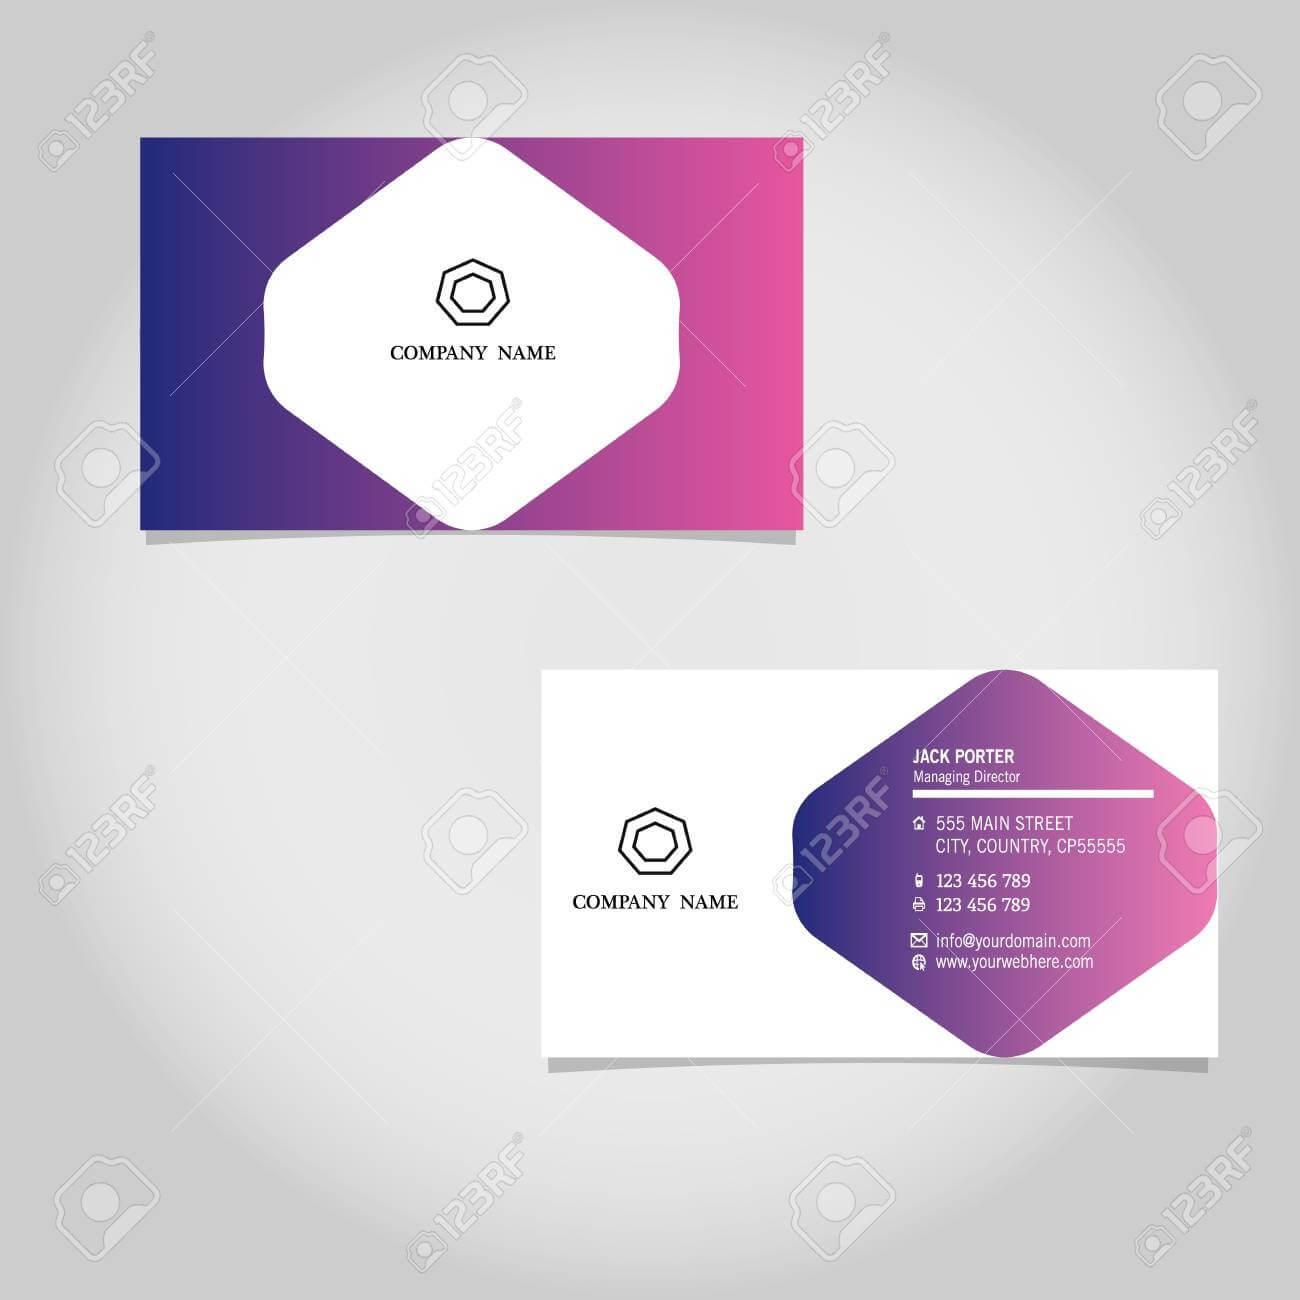 Vector Business Card Template Design Adobe Illustrator Throughout Adobe Illustrator Business Card Template